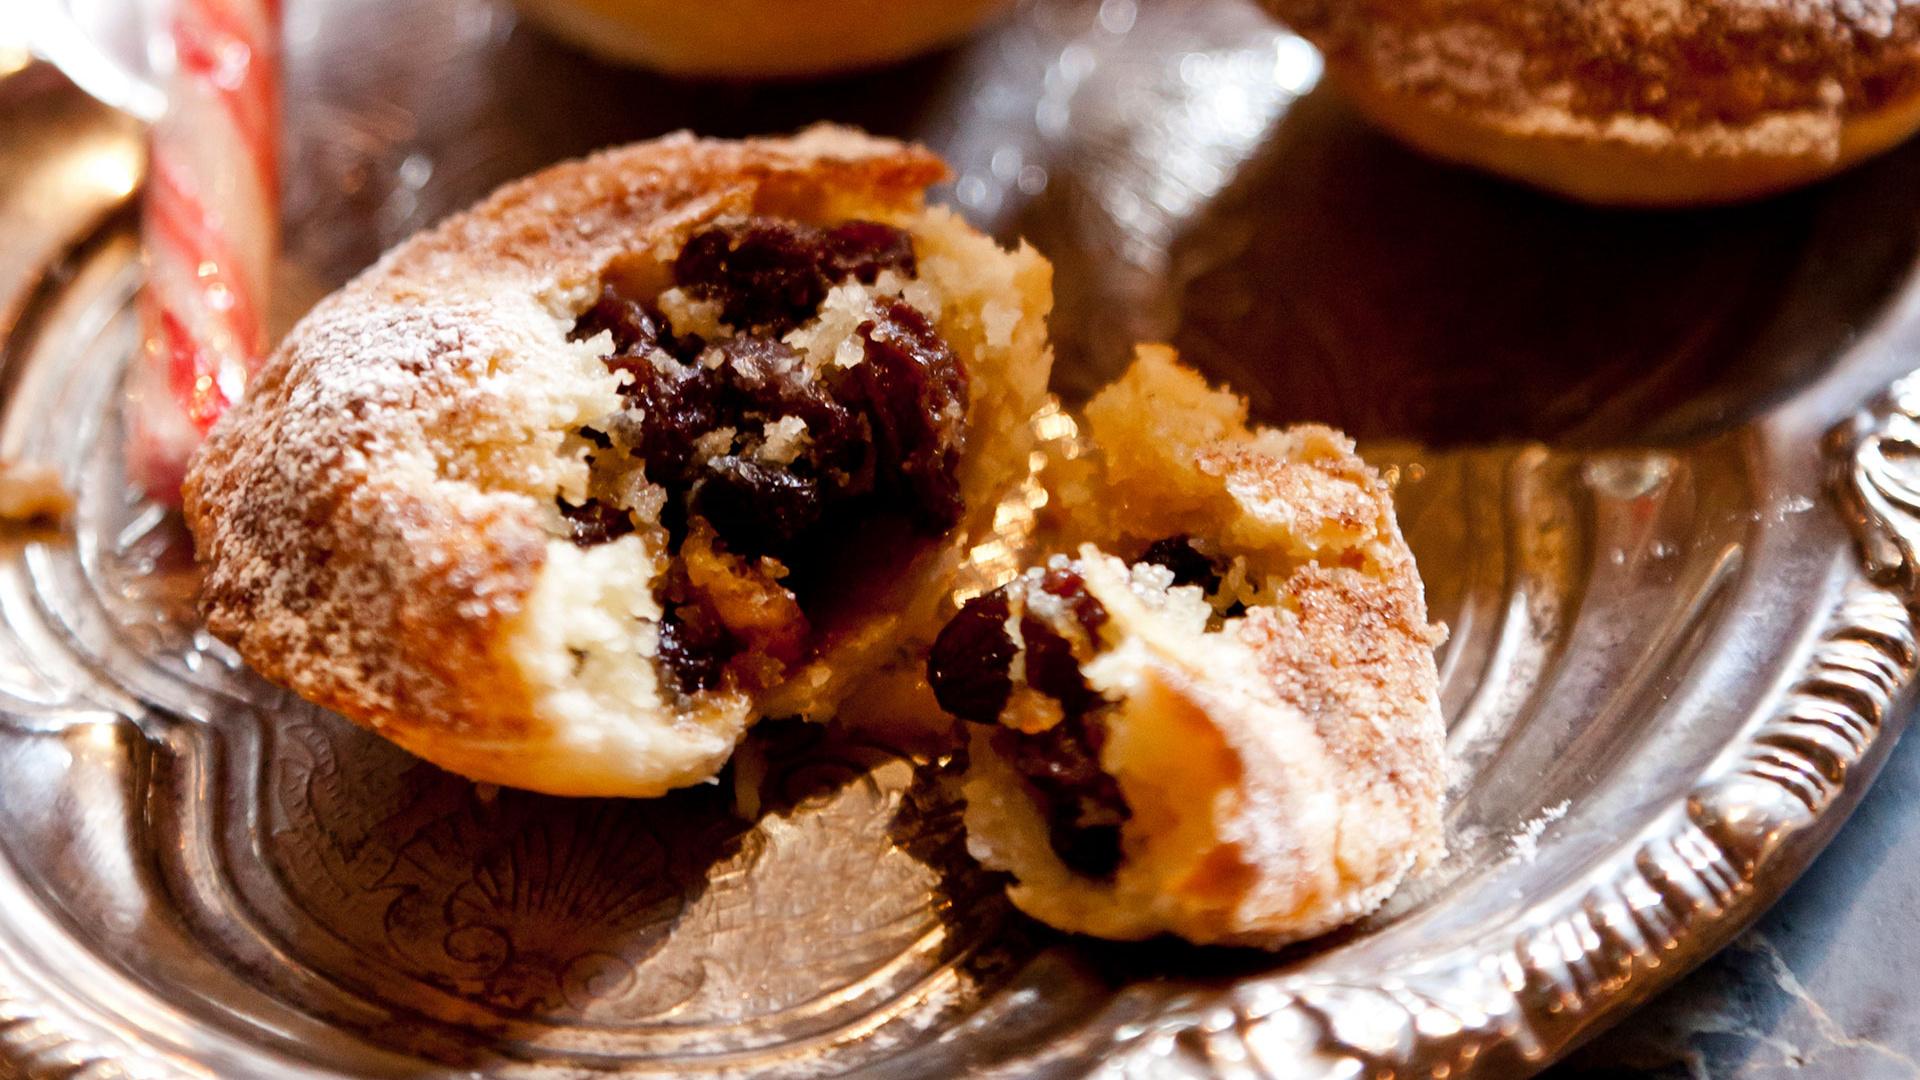 Chantelle Nicholson's frangipane mince pies